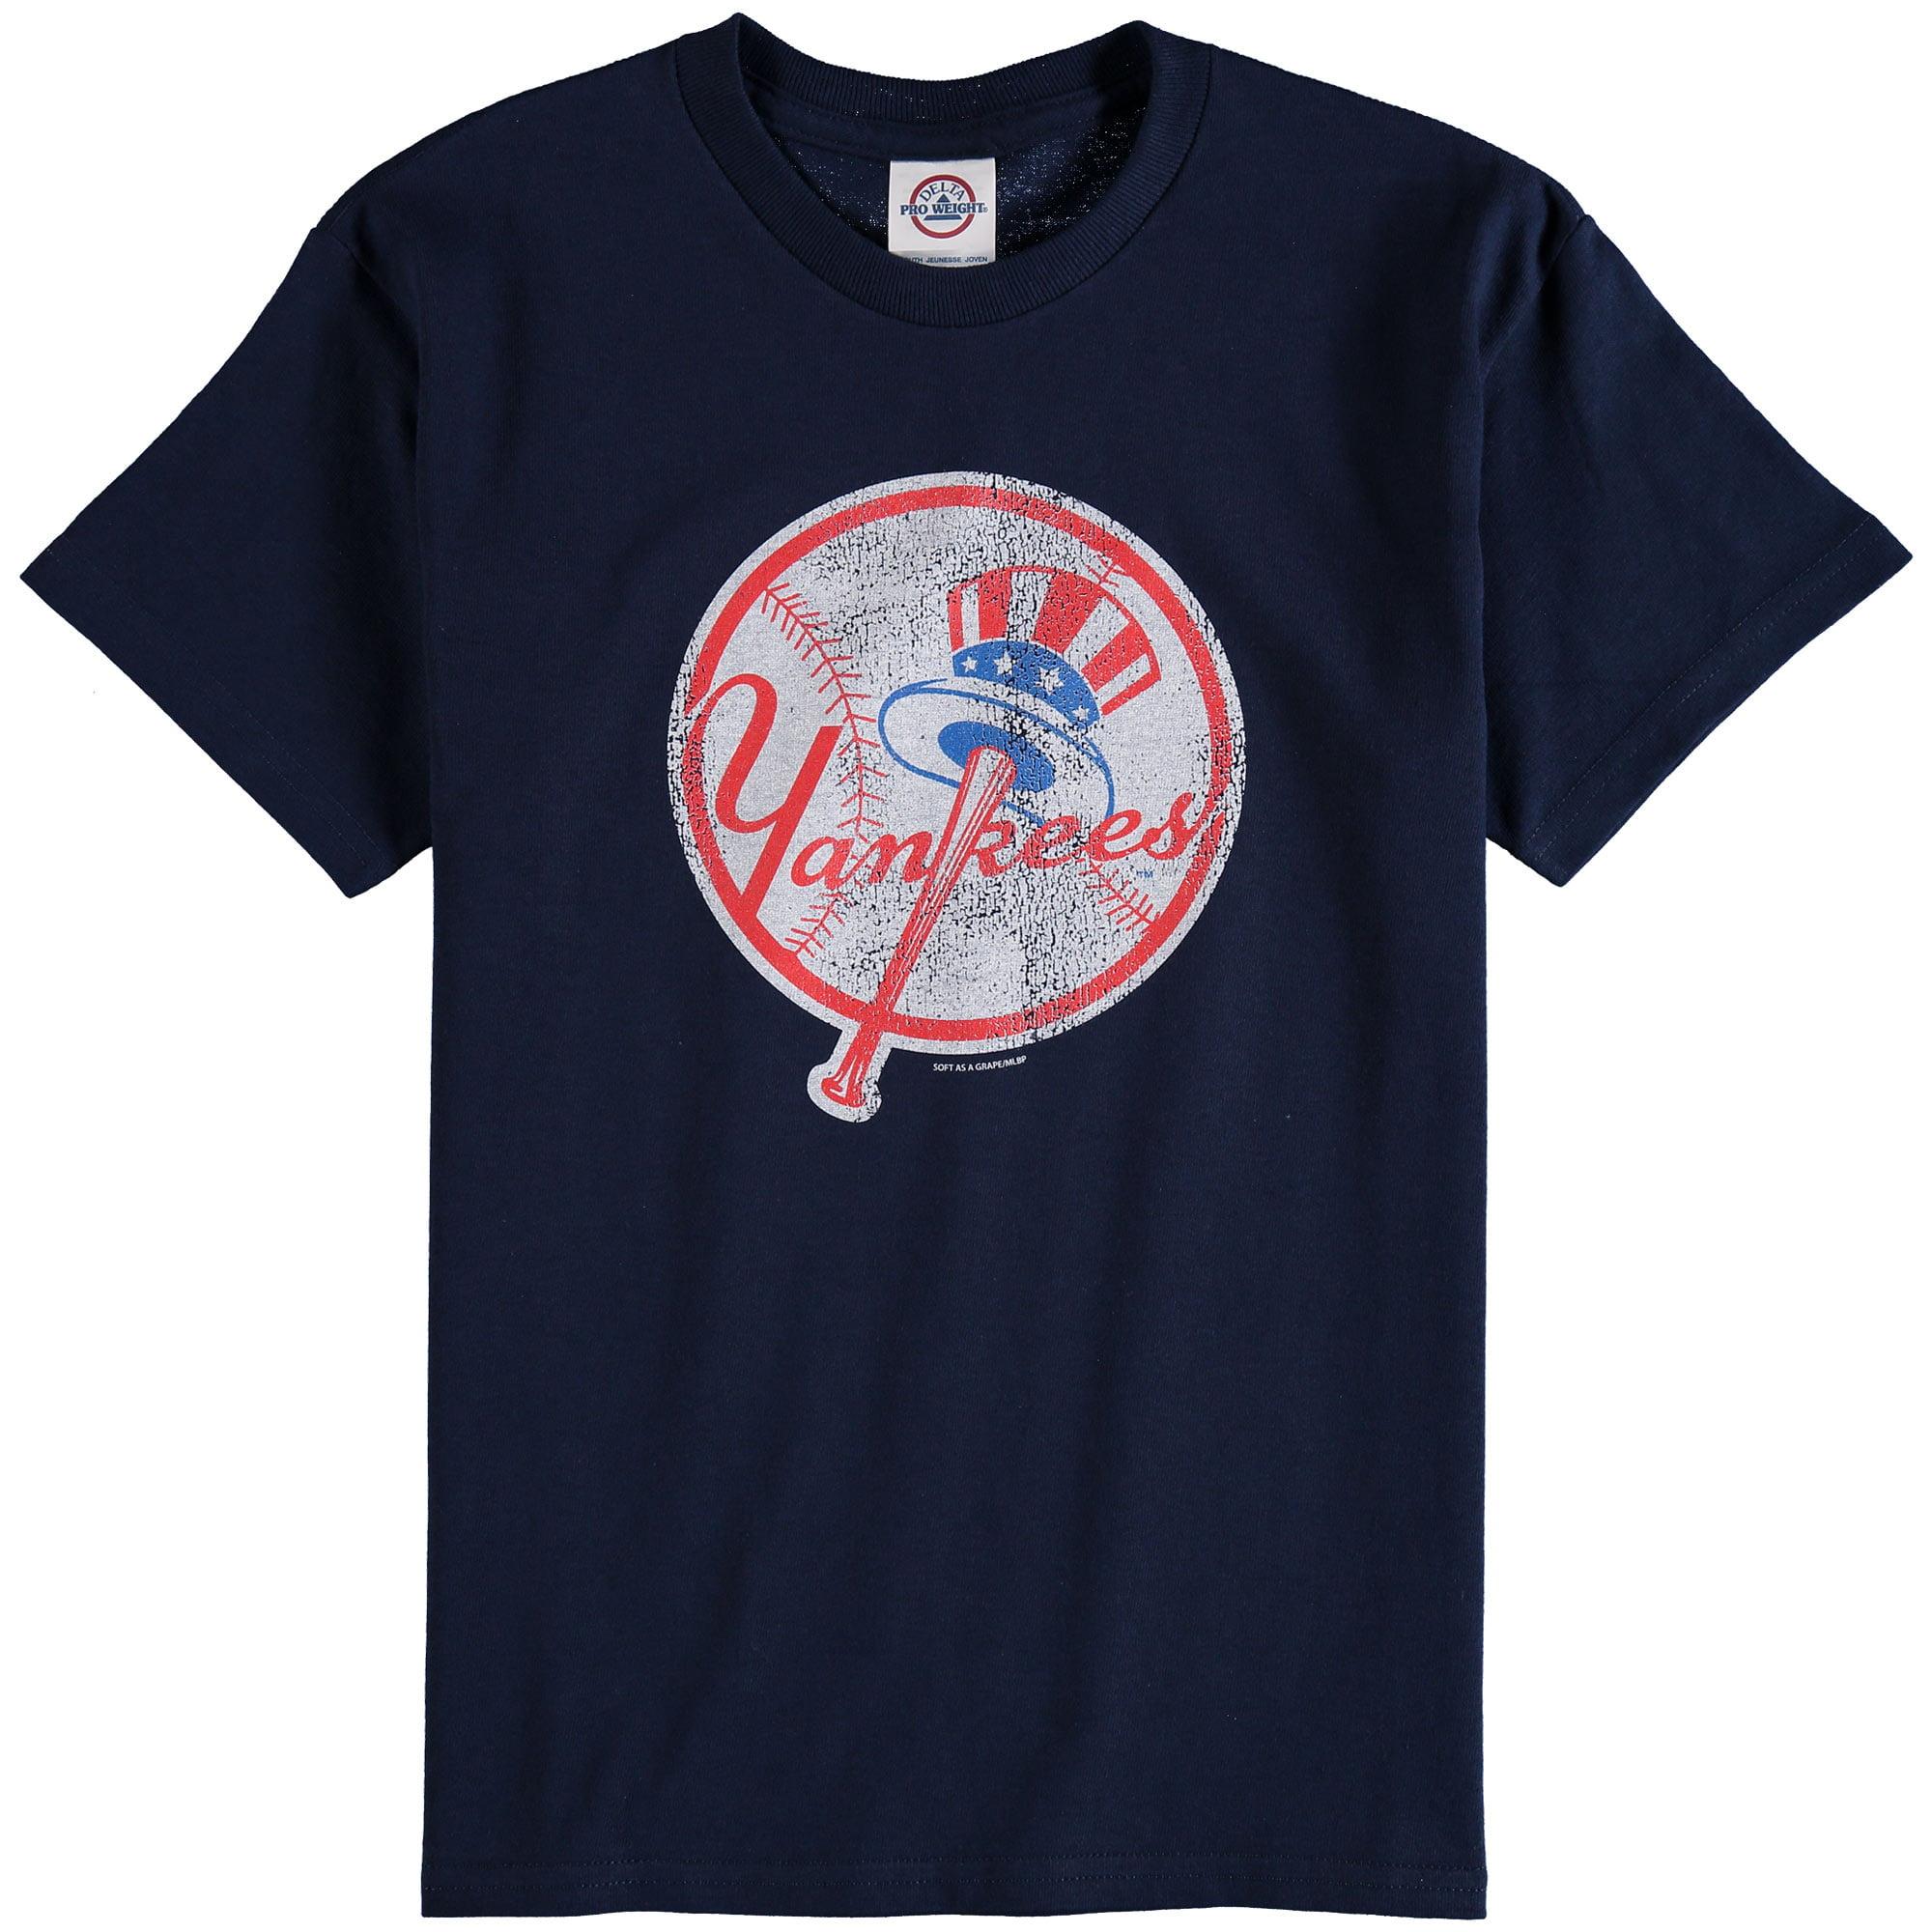 New York Yankees Youth Distressed Logo T-Shirt - Navy Blue